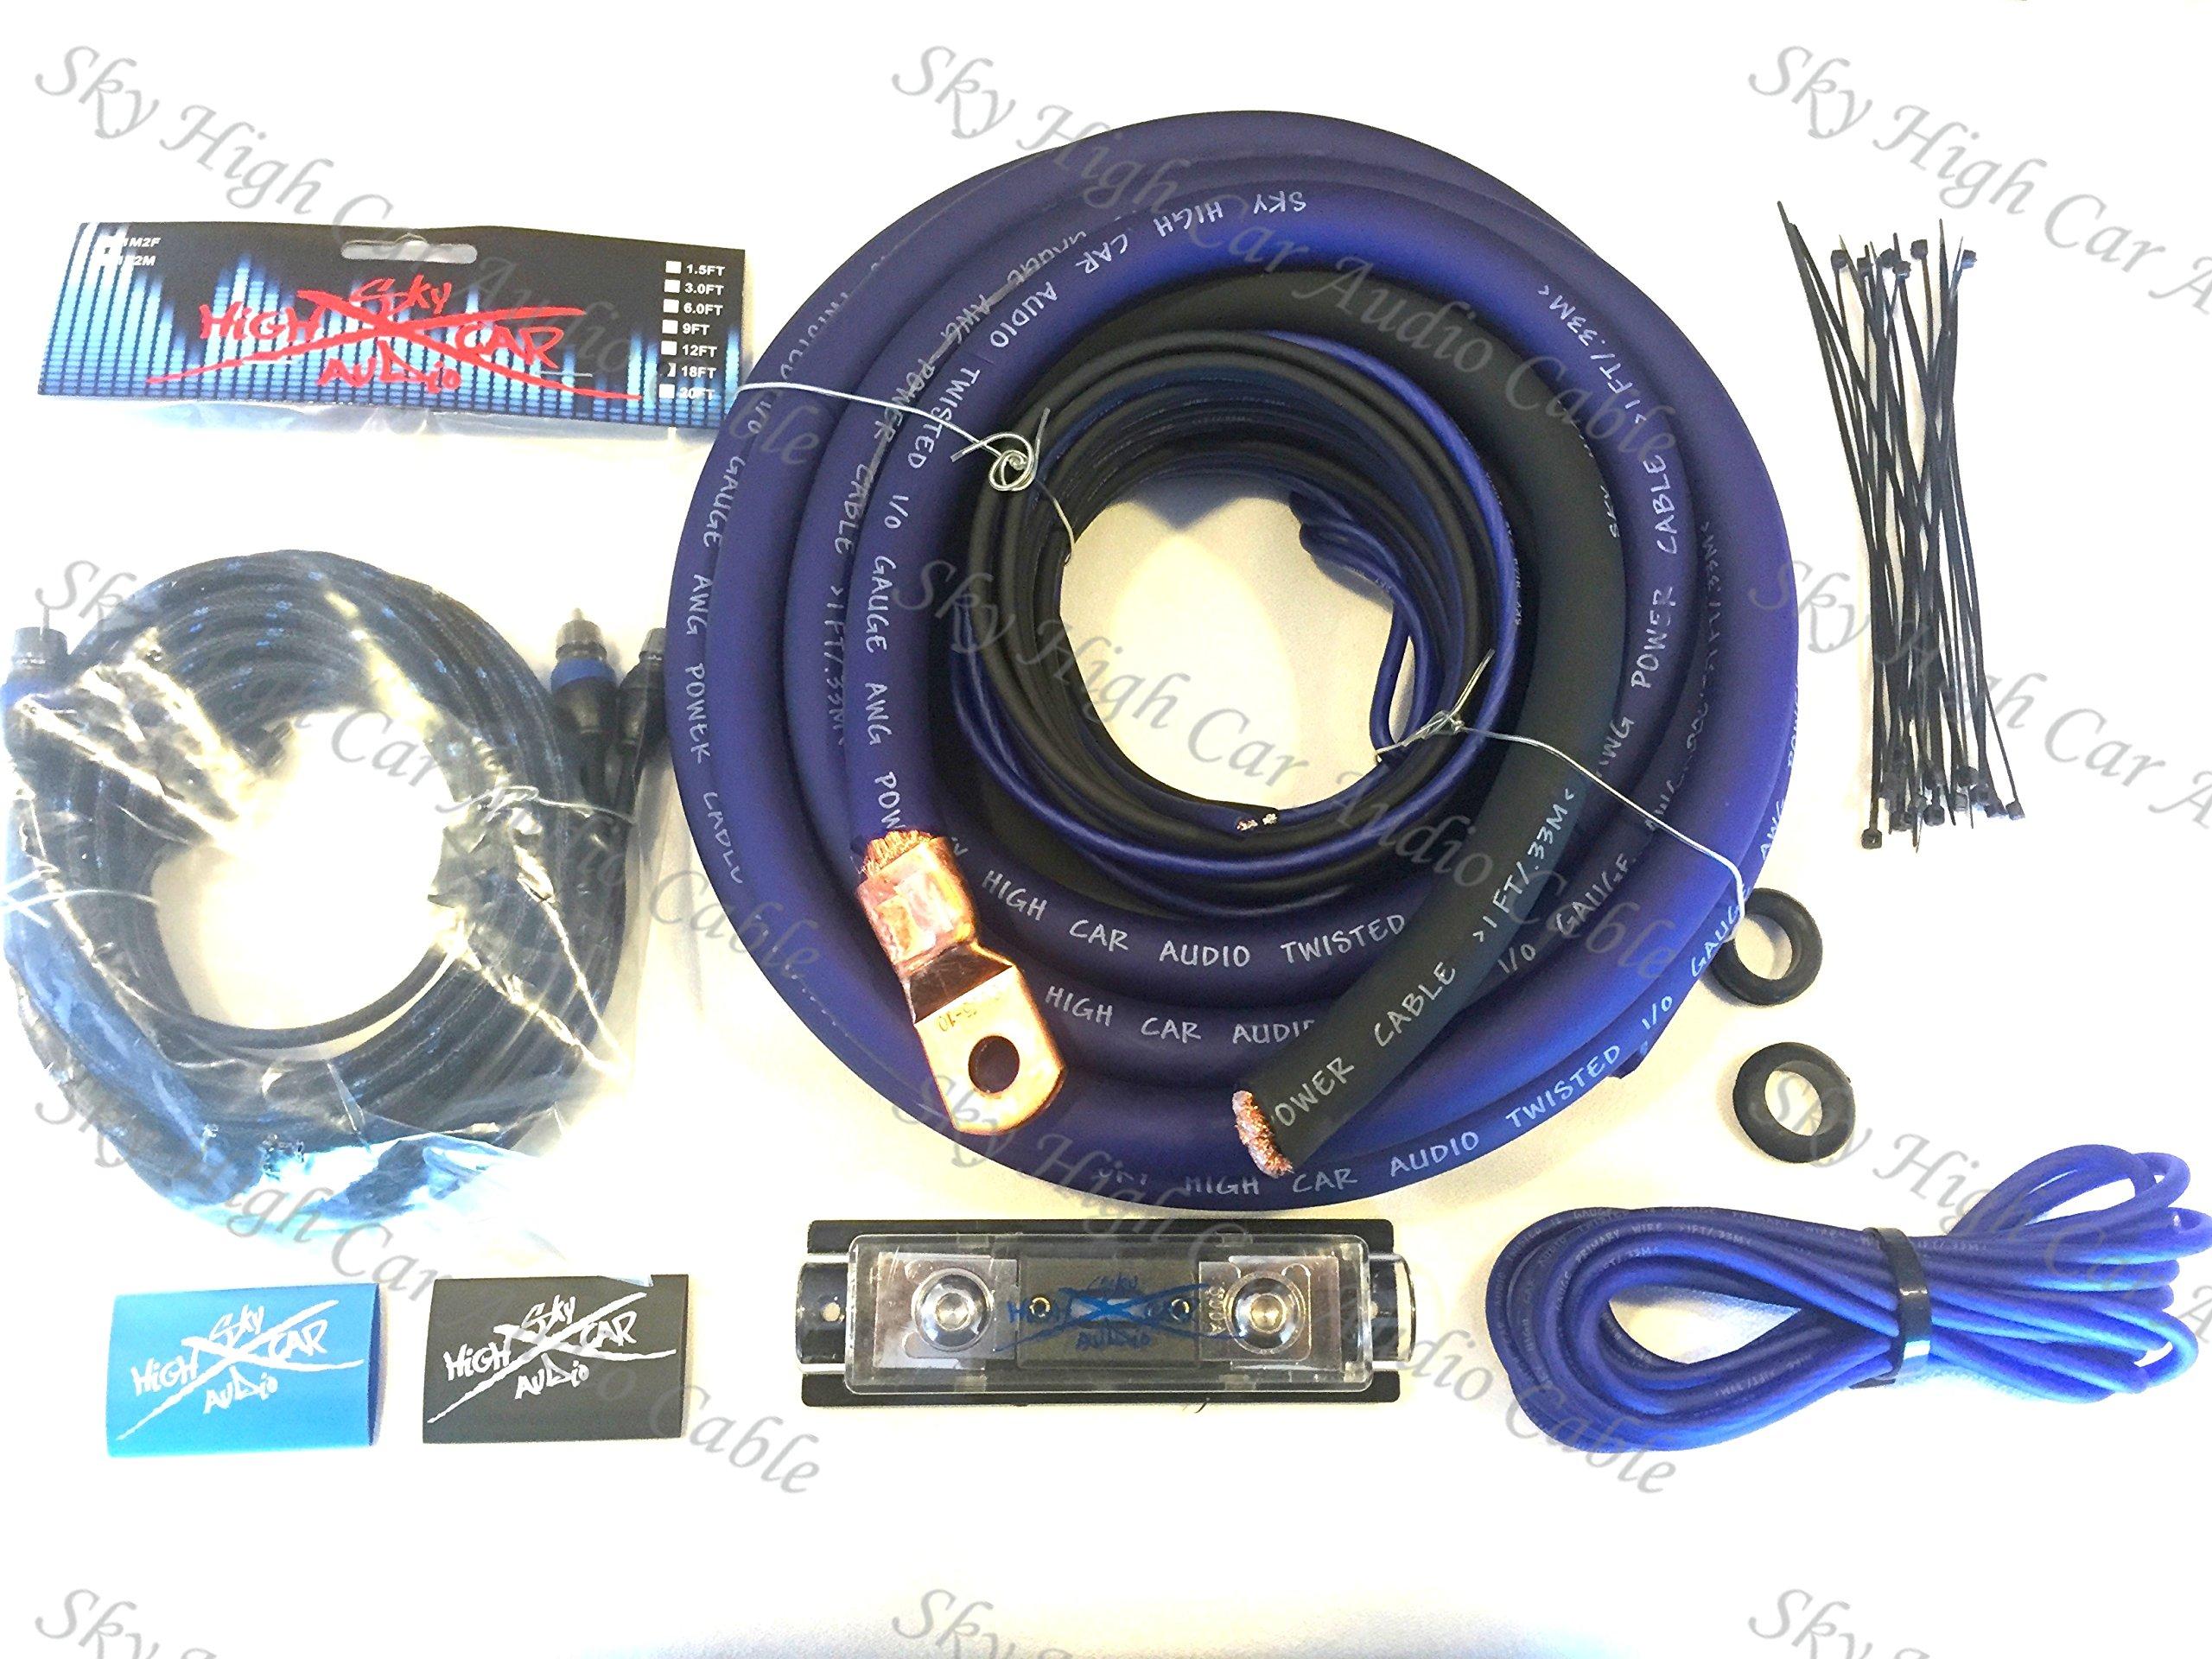 Oversized 1/0 Ga OFC AWG Amp Kit Triple Shielded RCA Blue Black Complete Sky High